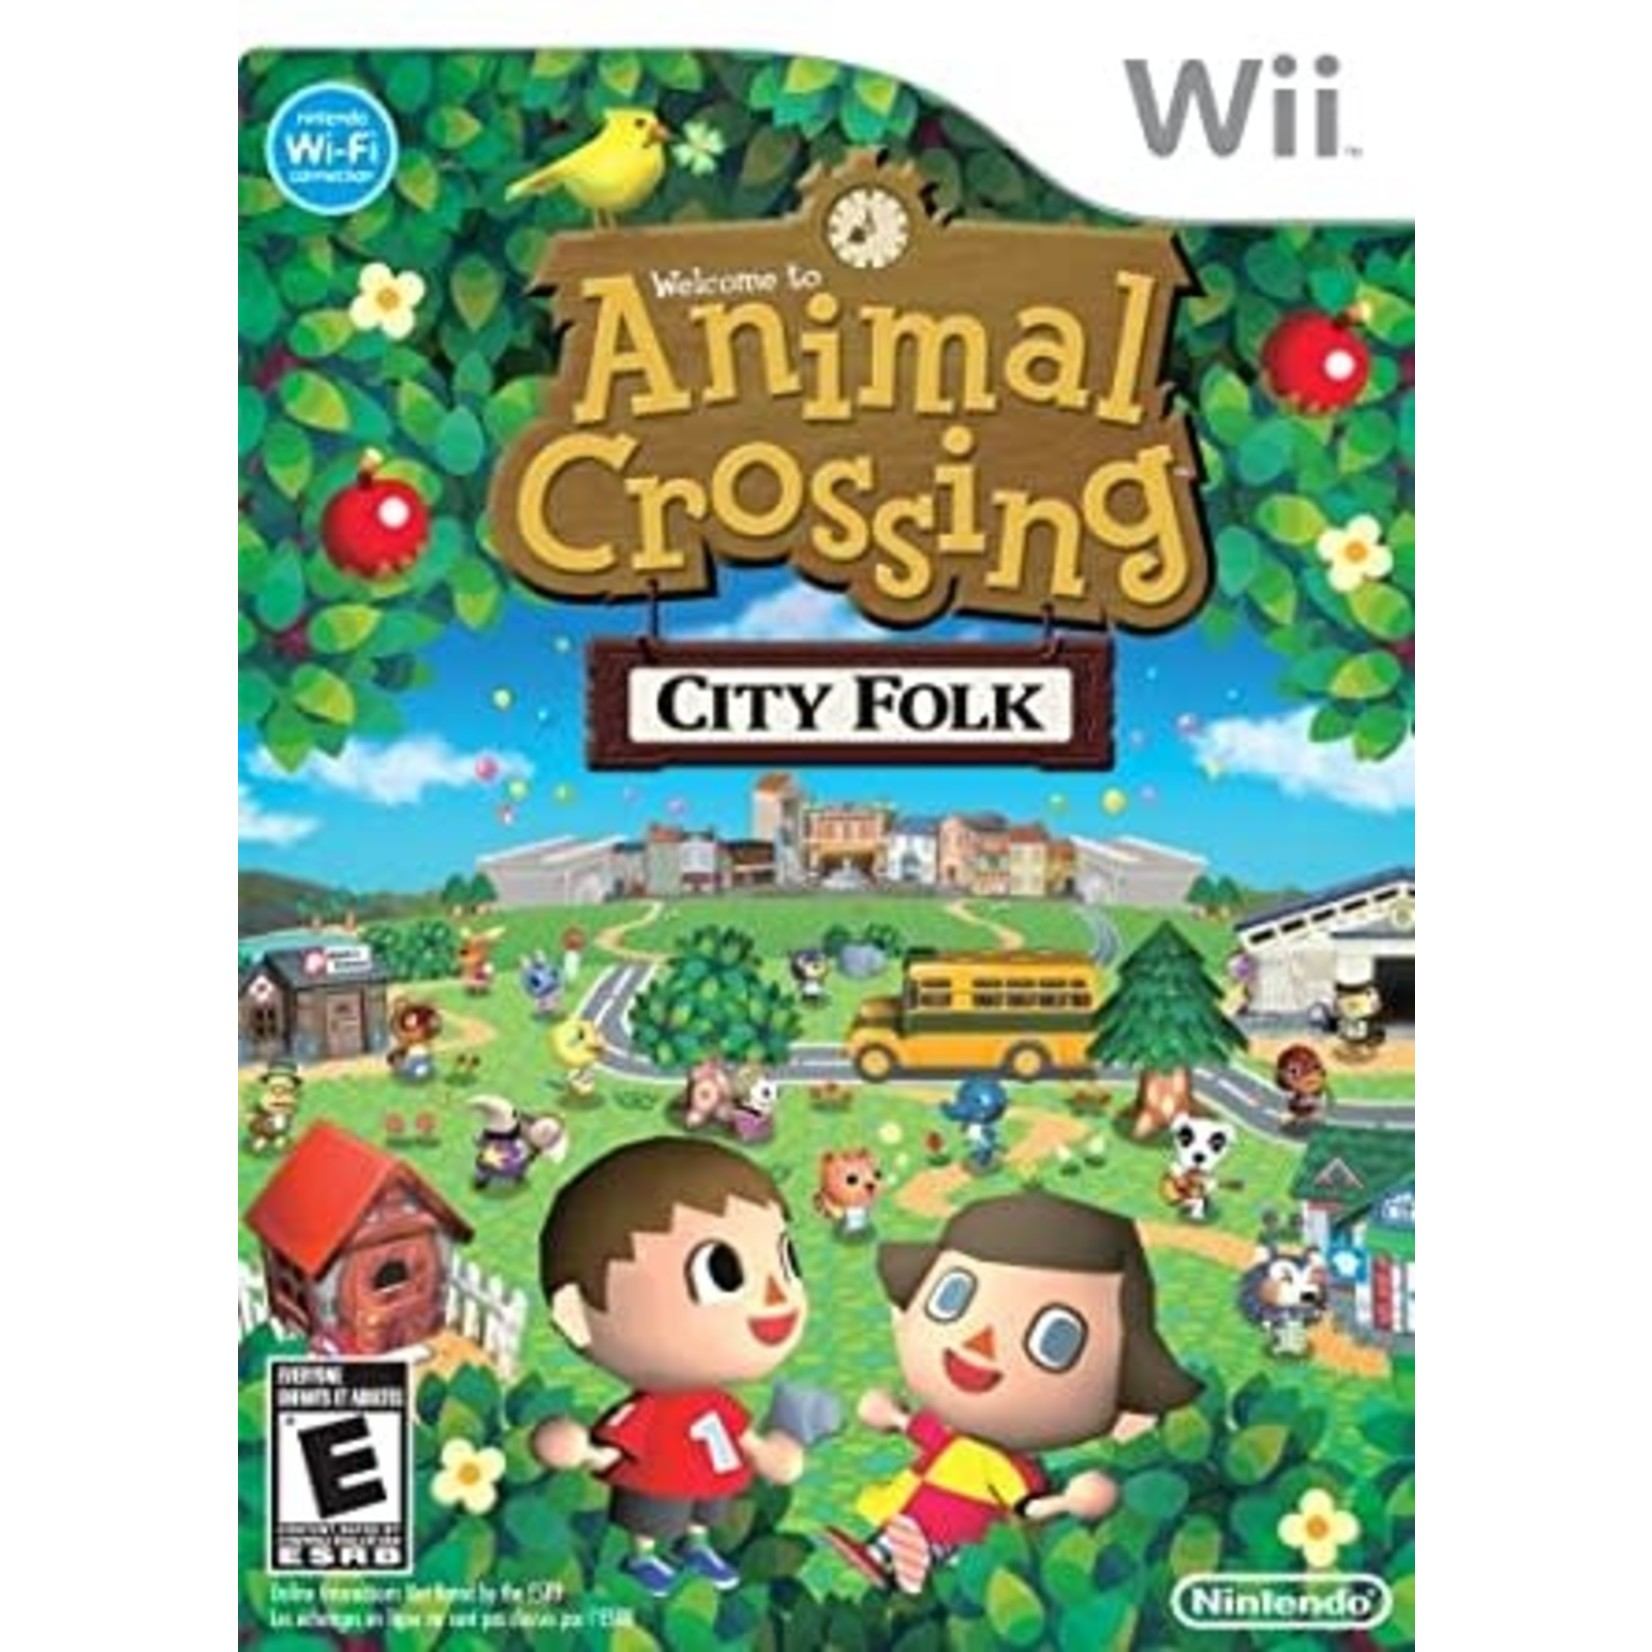 WIIUSD-Animal Crossing City Folk